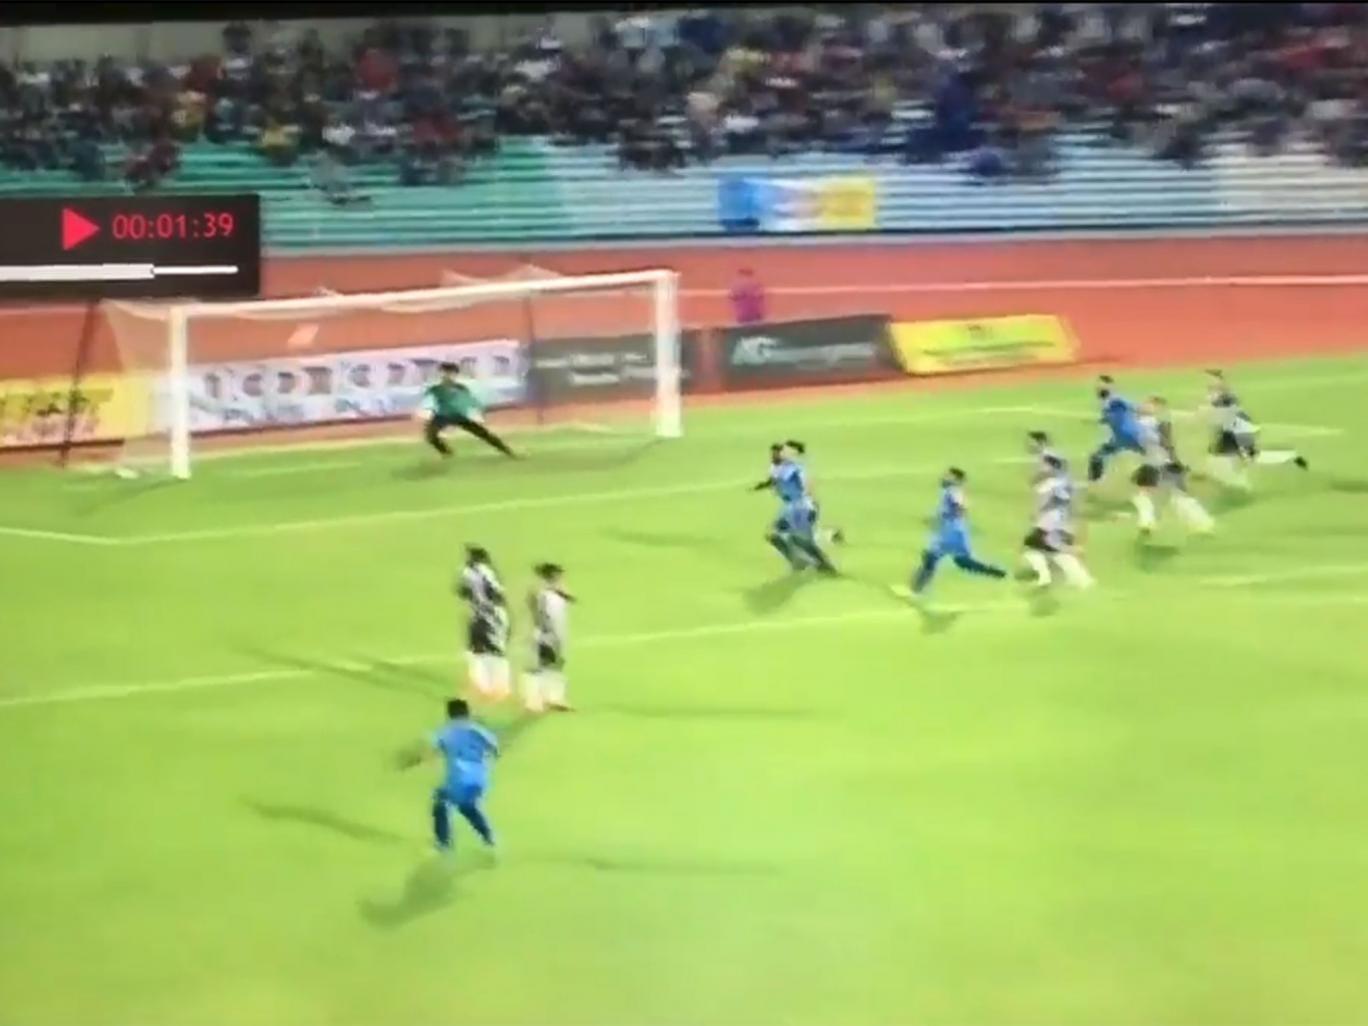 Faiz Subri's wonder goal attracts footballing world's attention